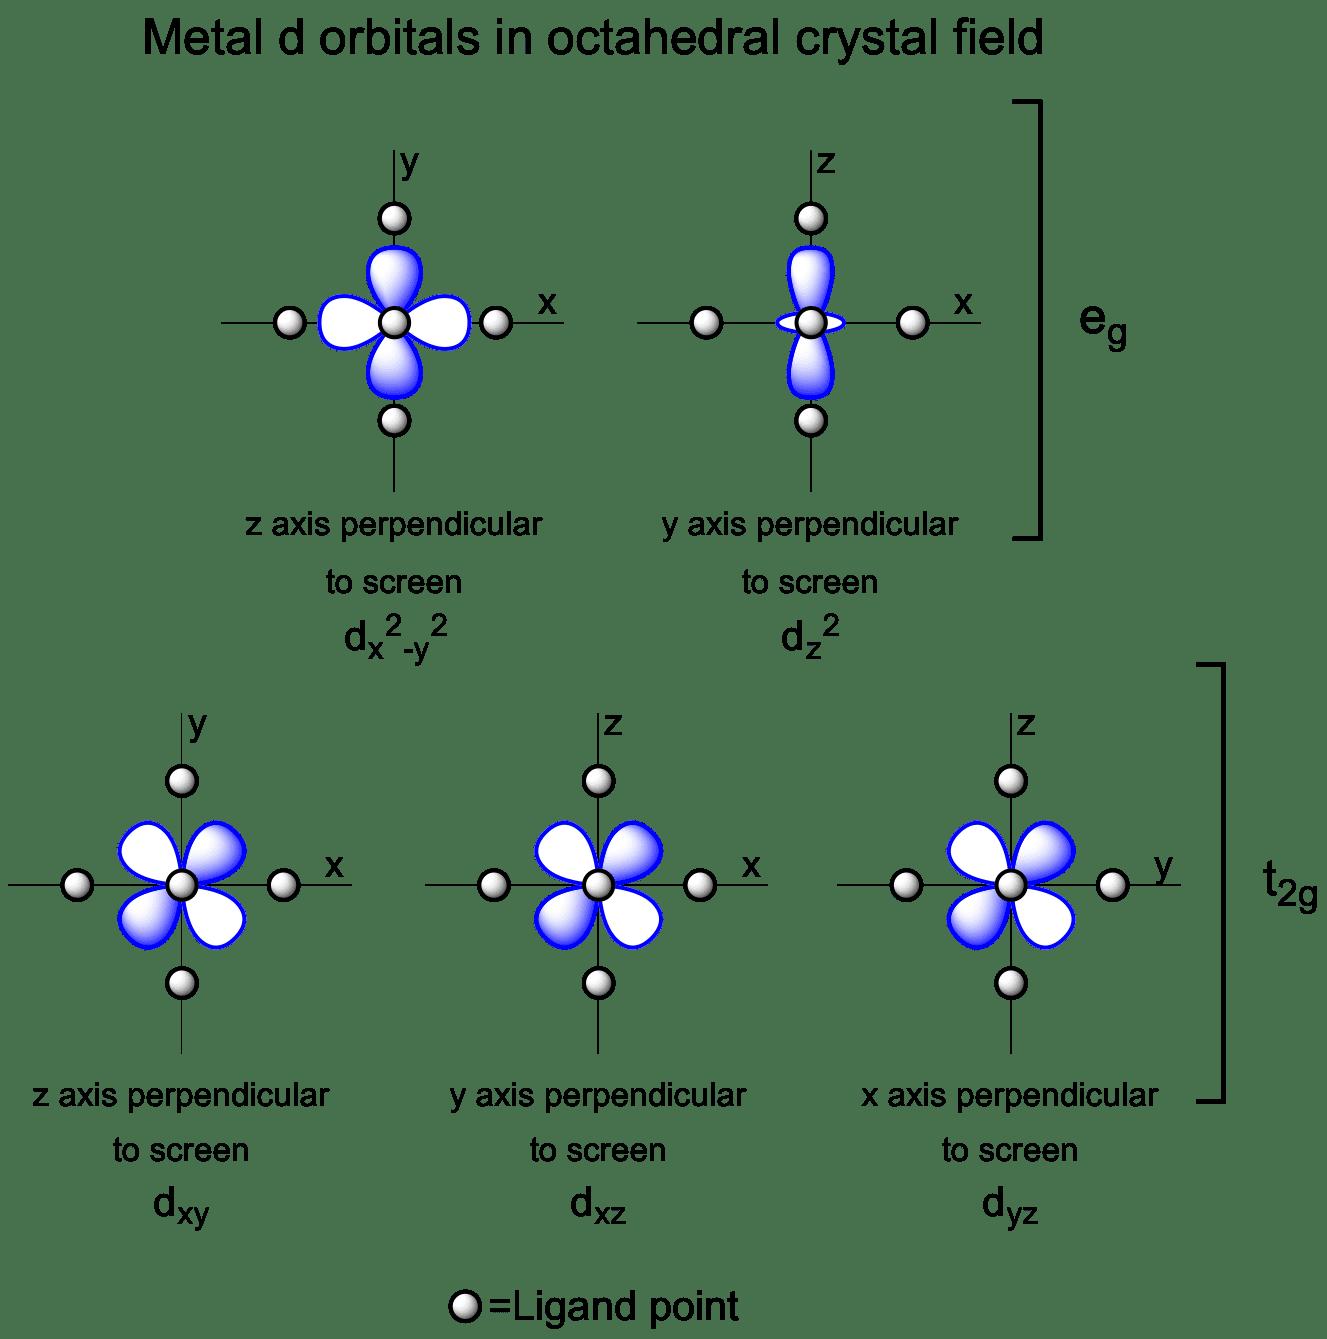 molecular orbital diagram of oh server power supply wiring metal d orbitals in an octahedral crystal field